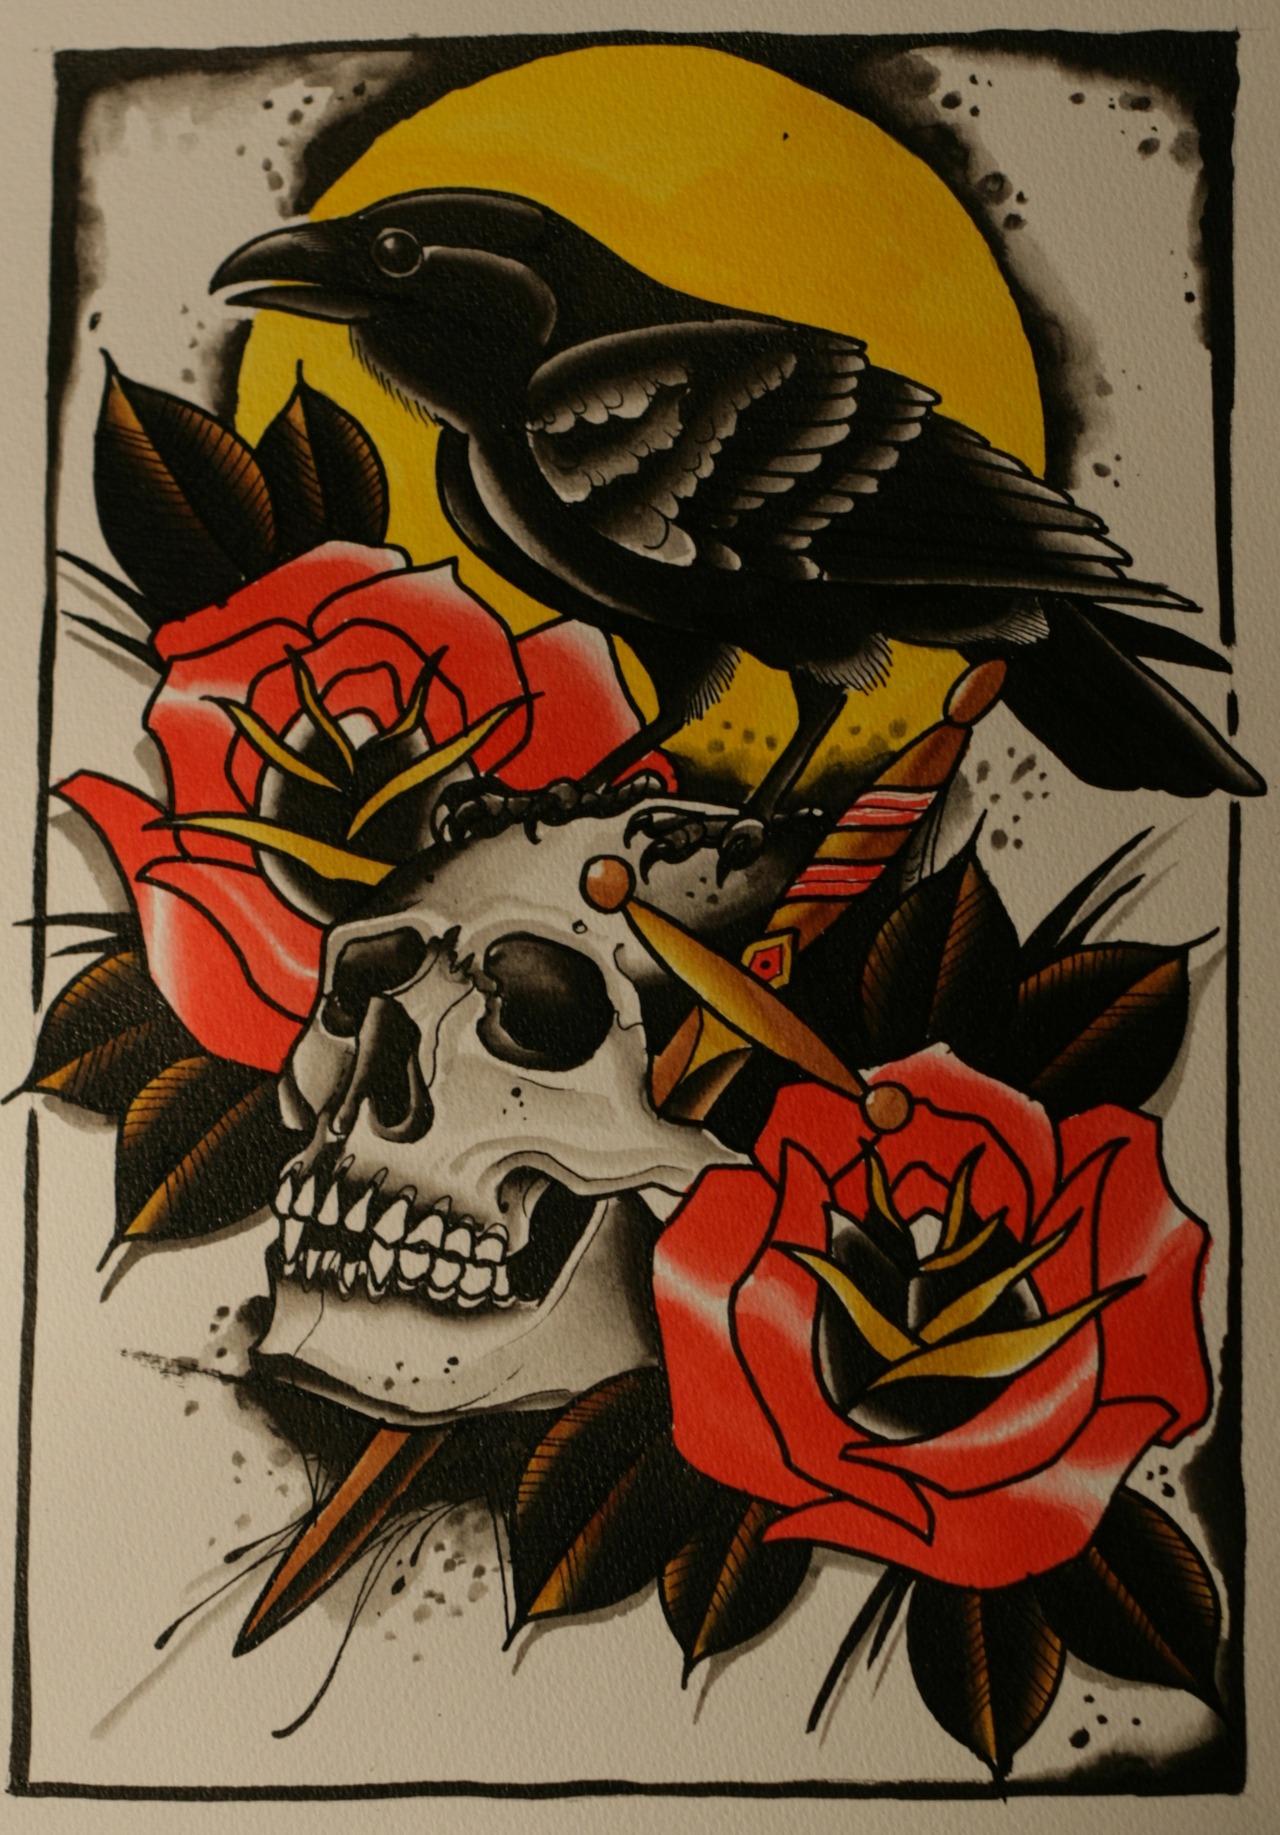 Traditional Raven Tattoo